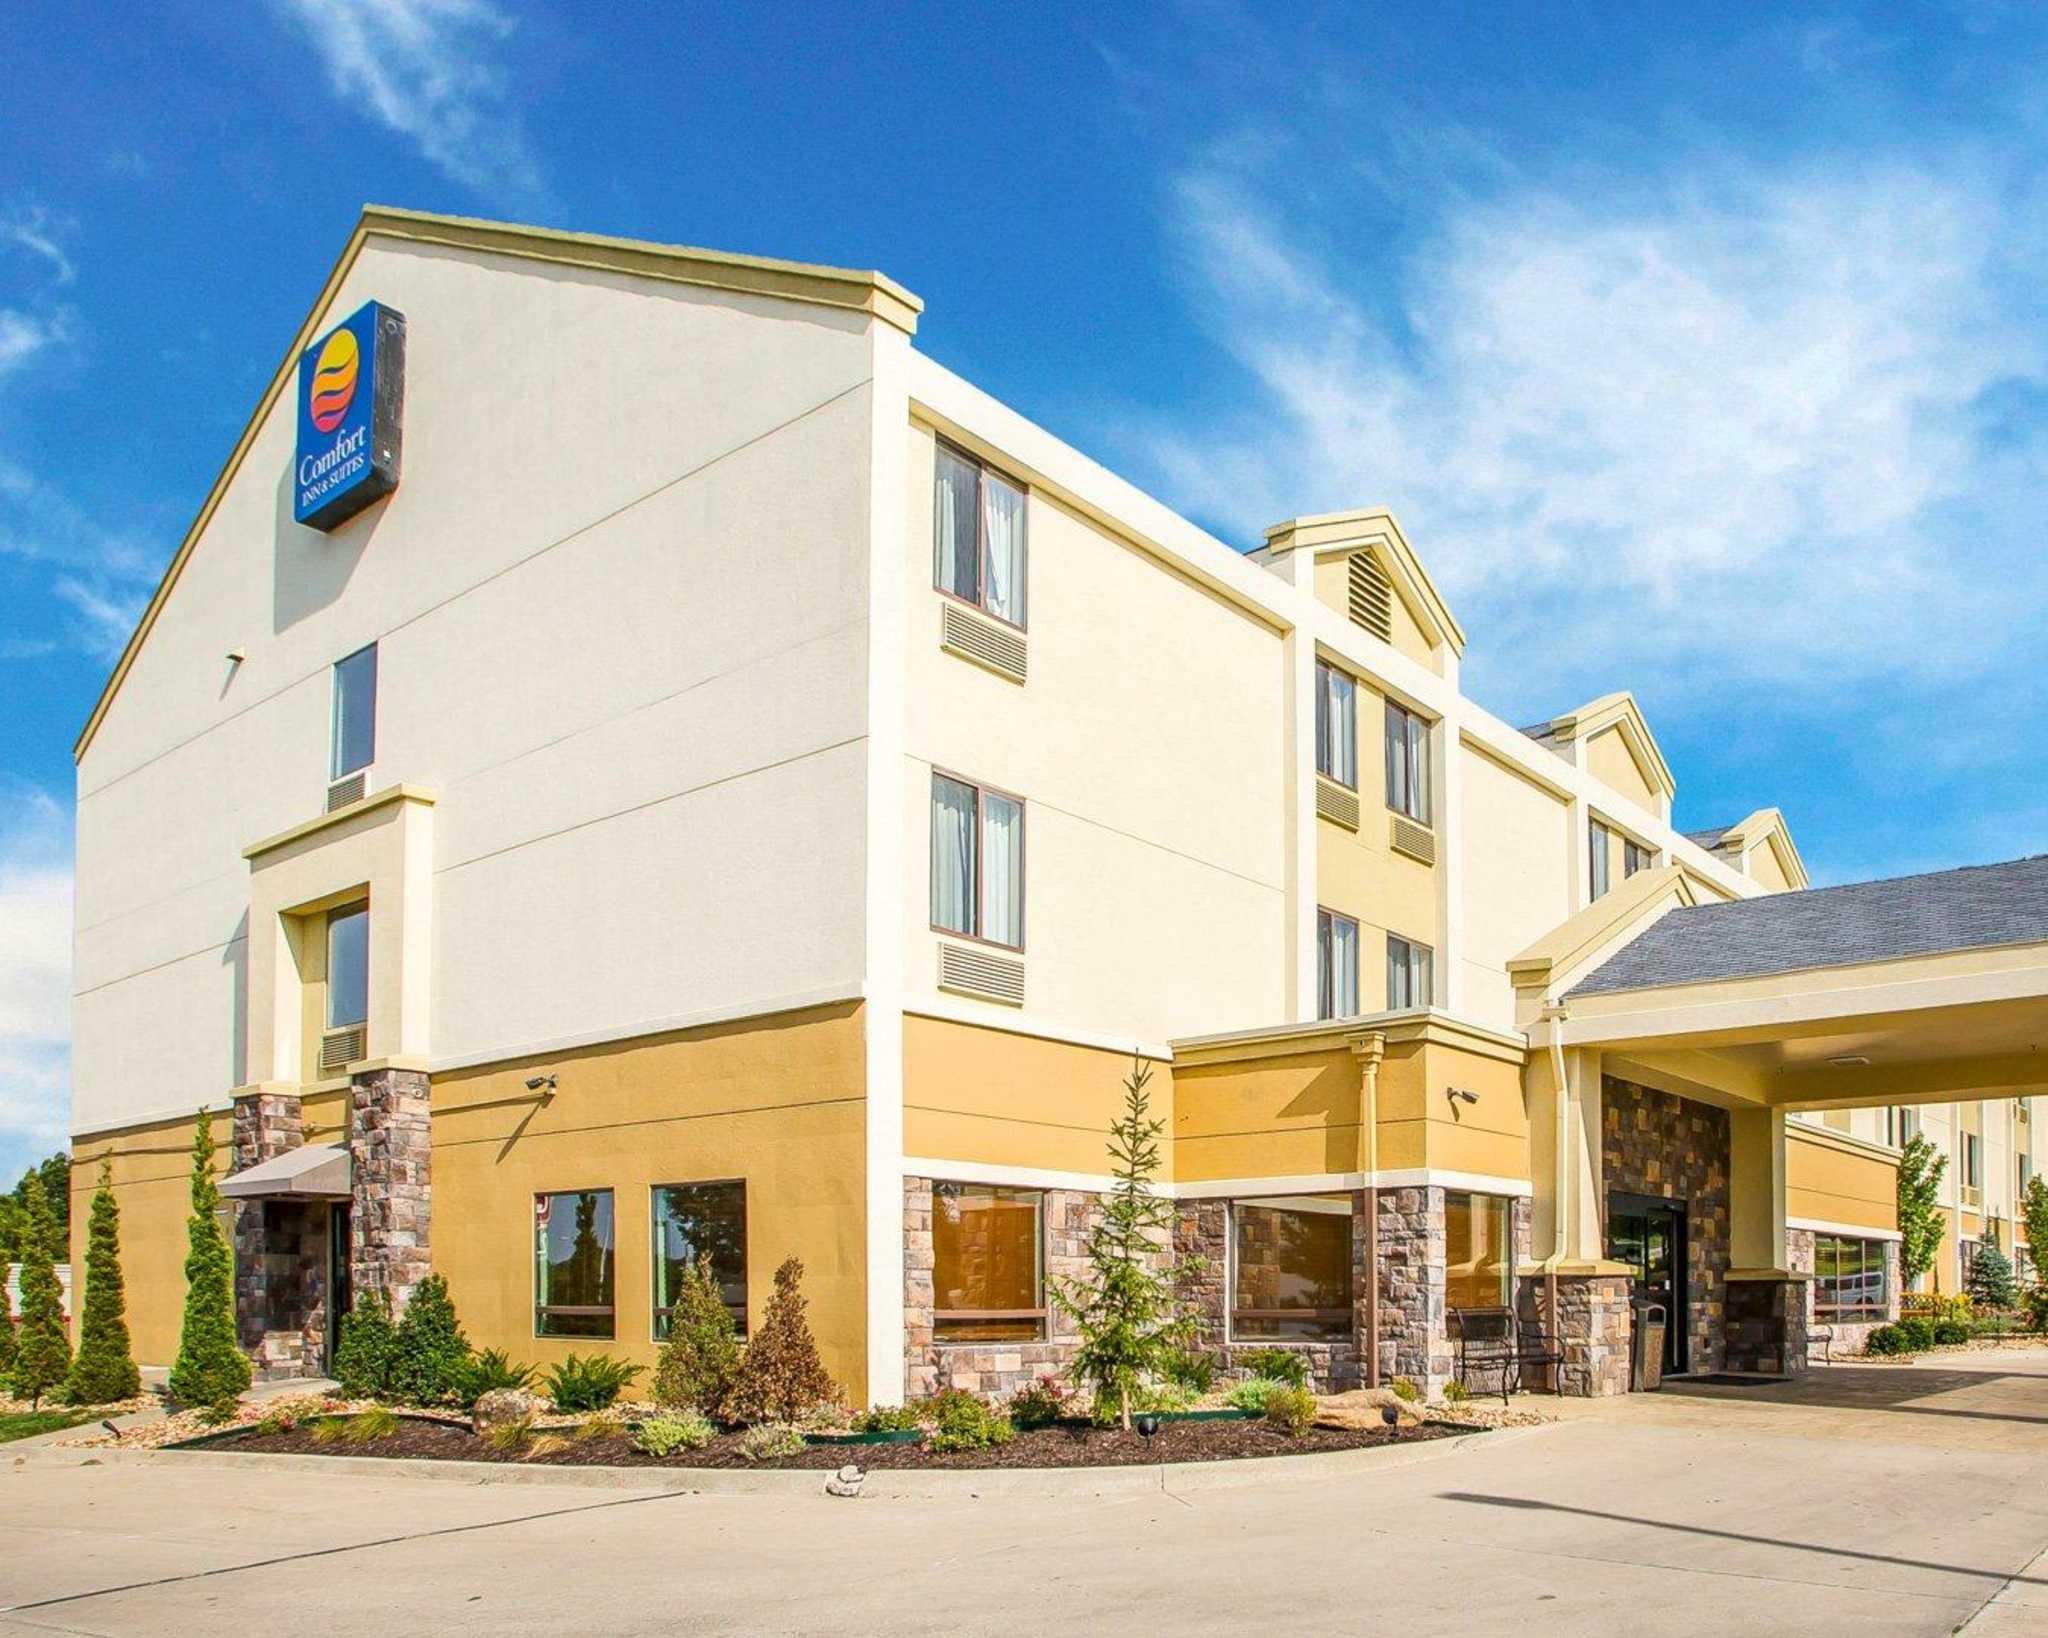 Comfort Inn & Suites Kansas City - Northeast image 2